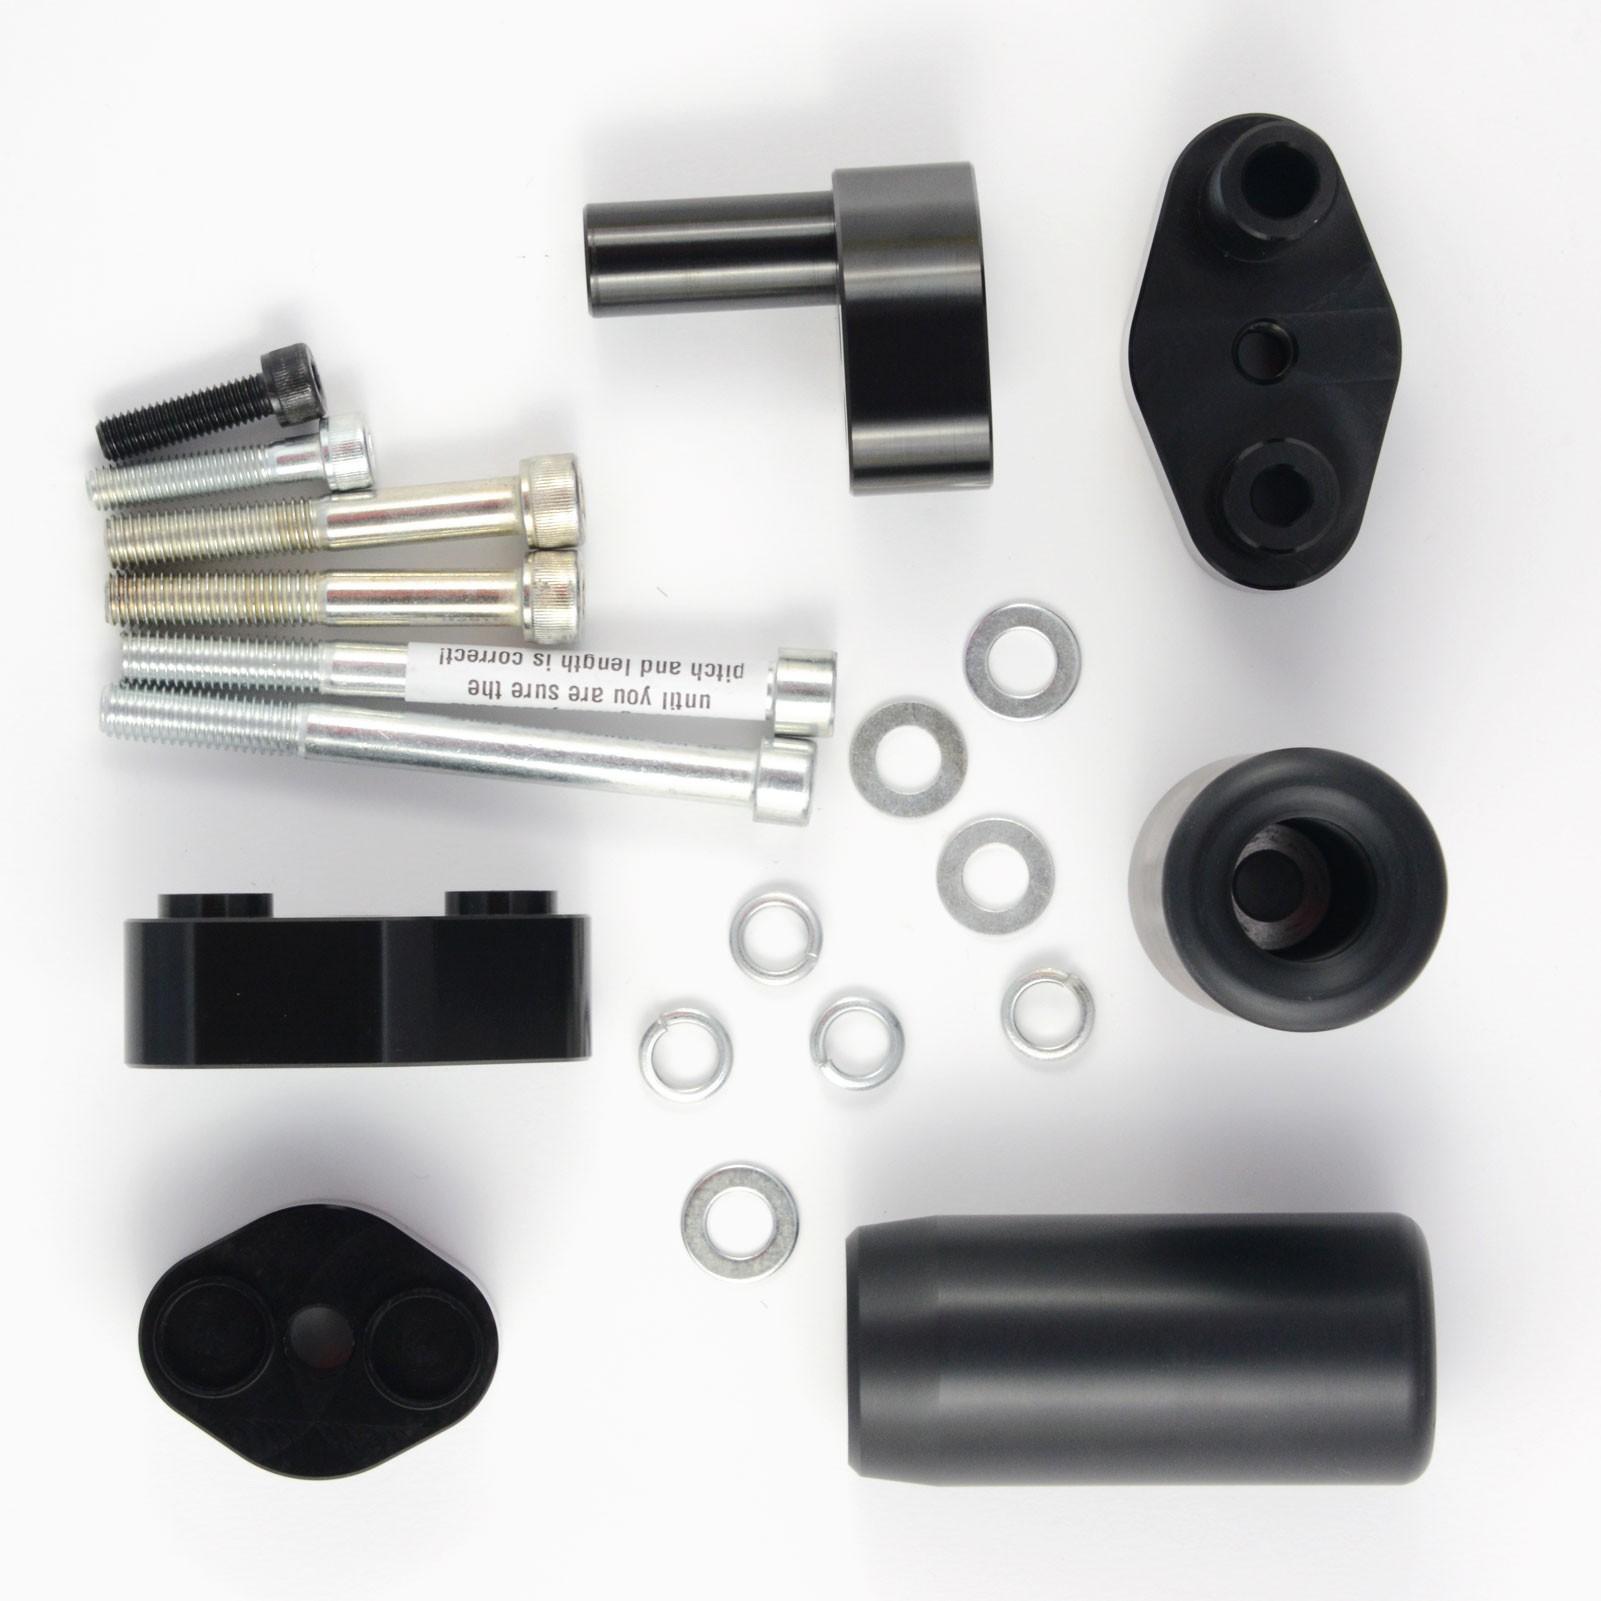 PM-1037-black-a-pro-tamponi-paracarena-protector-frame-slider-sonicmotoshop